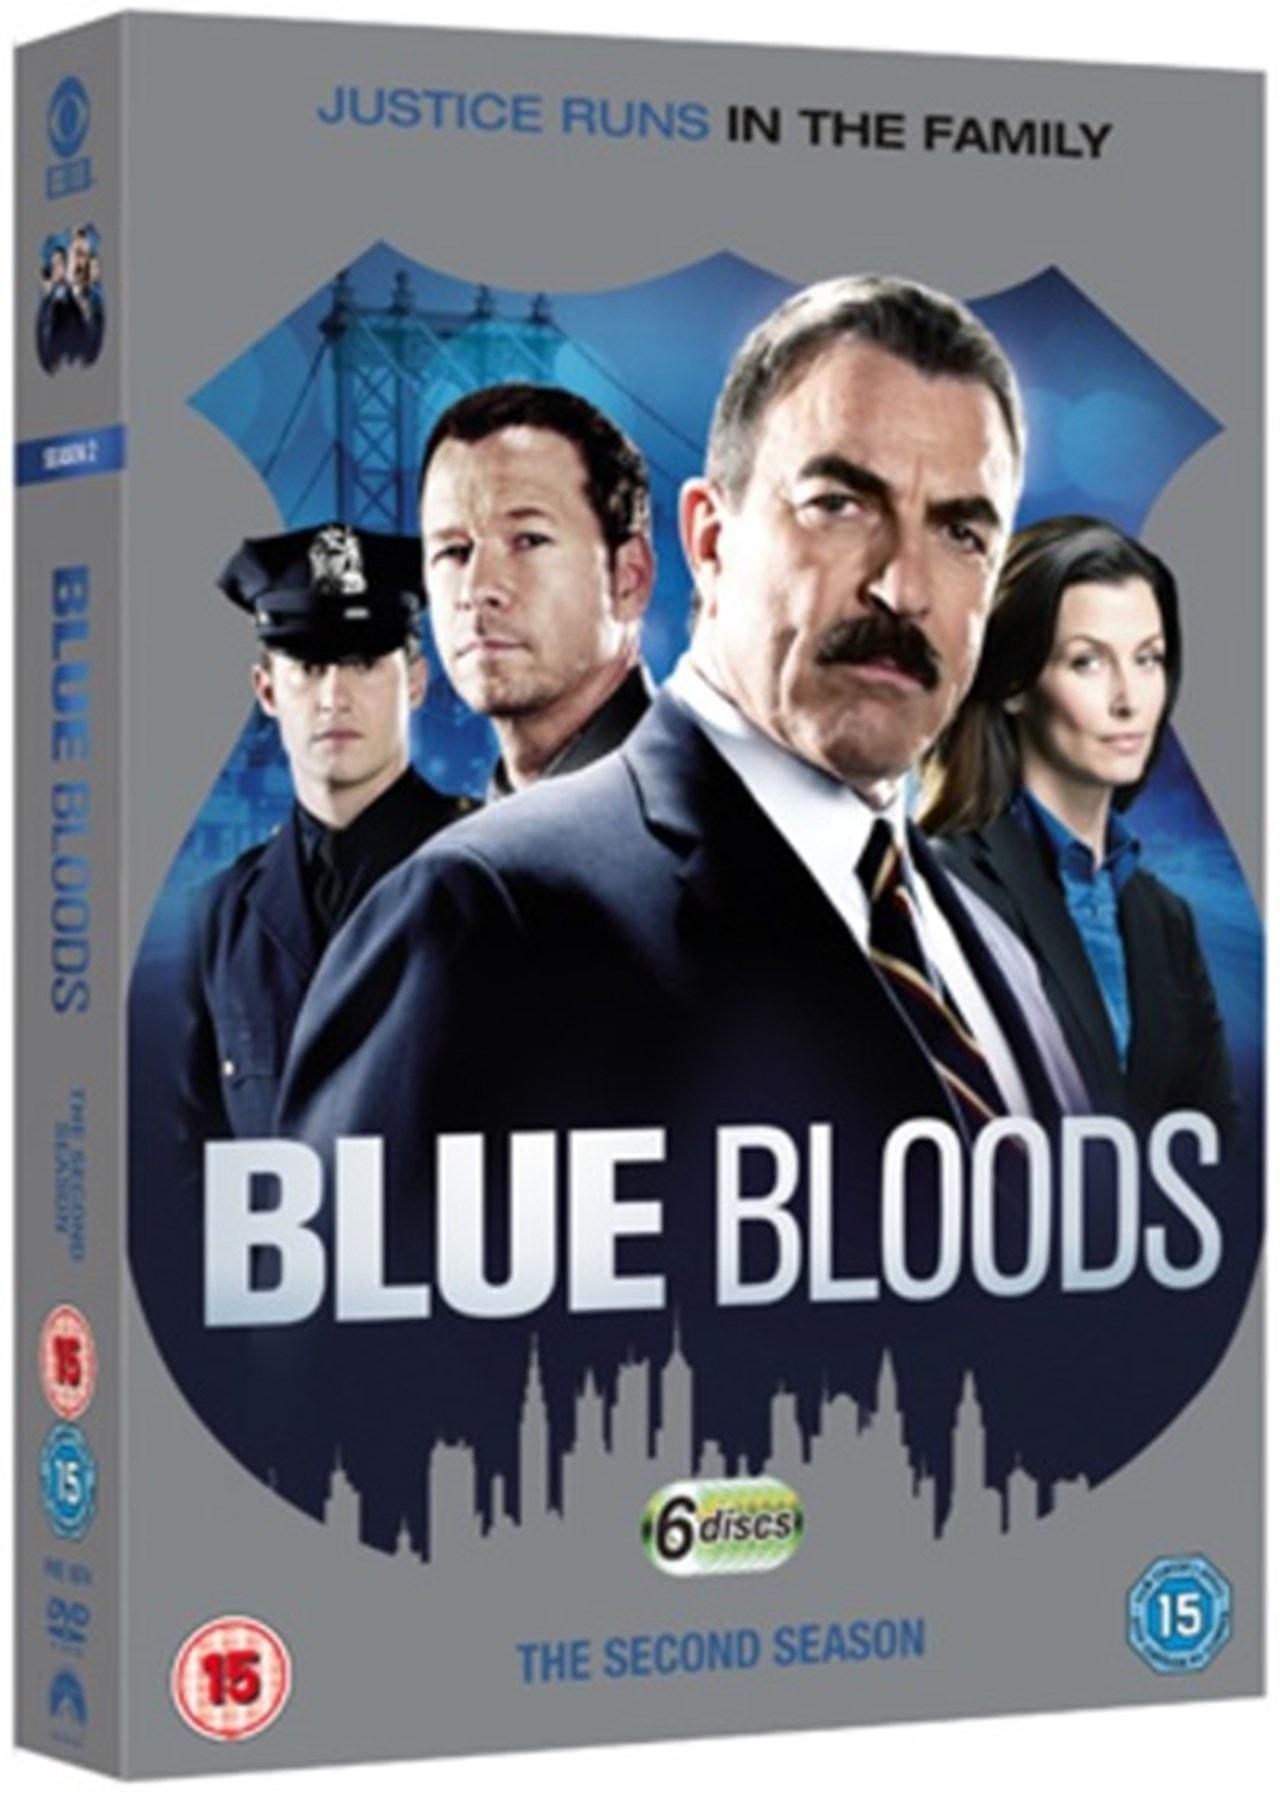 Blue Bloods: The Second Season - 1